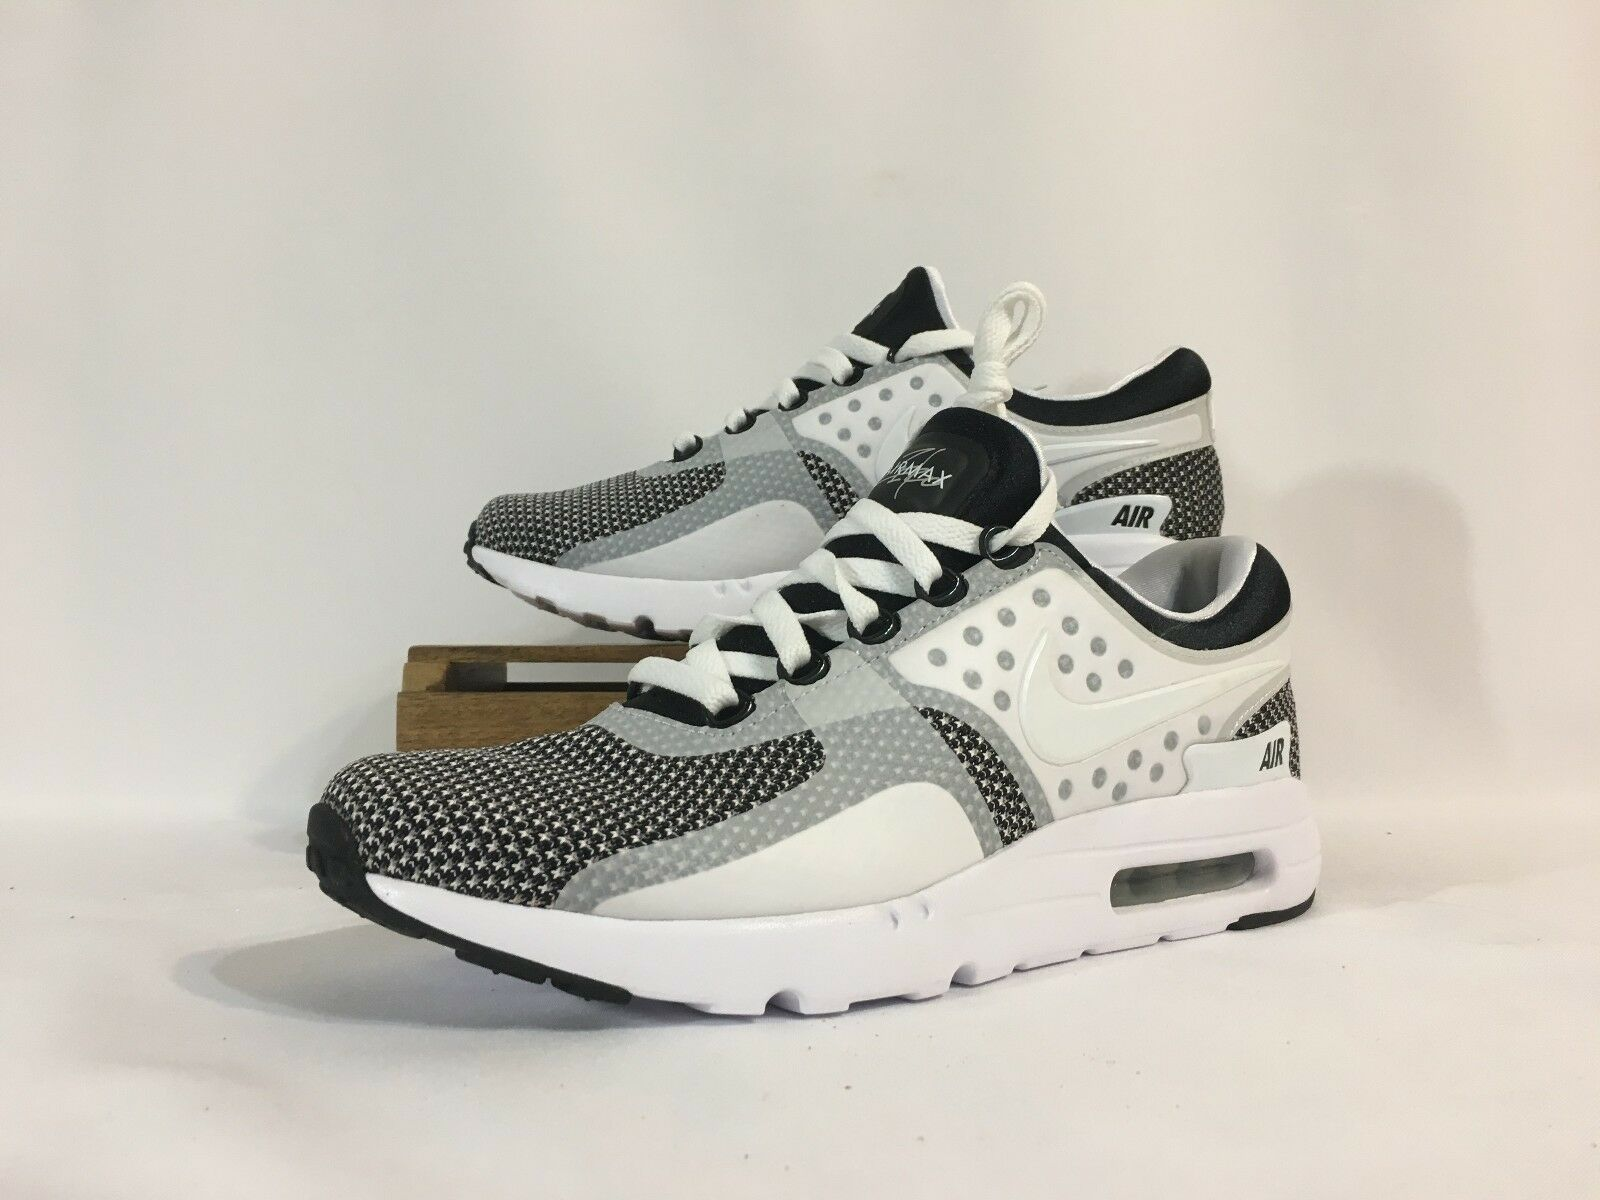 Nike Air Max Zero Essential Running Shoes White Black 876070-005 Men's 10 NWOB